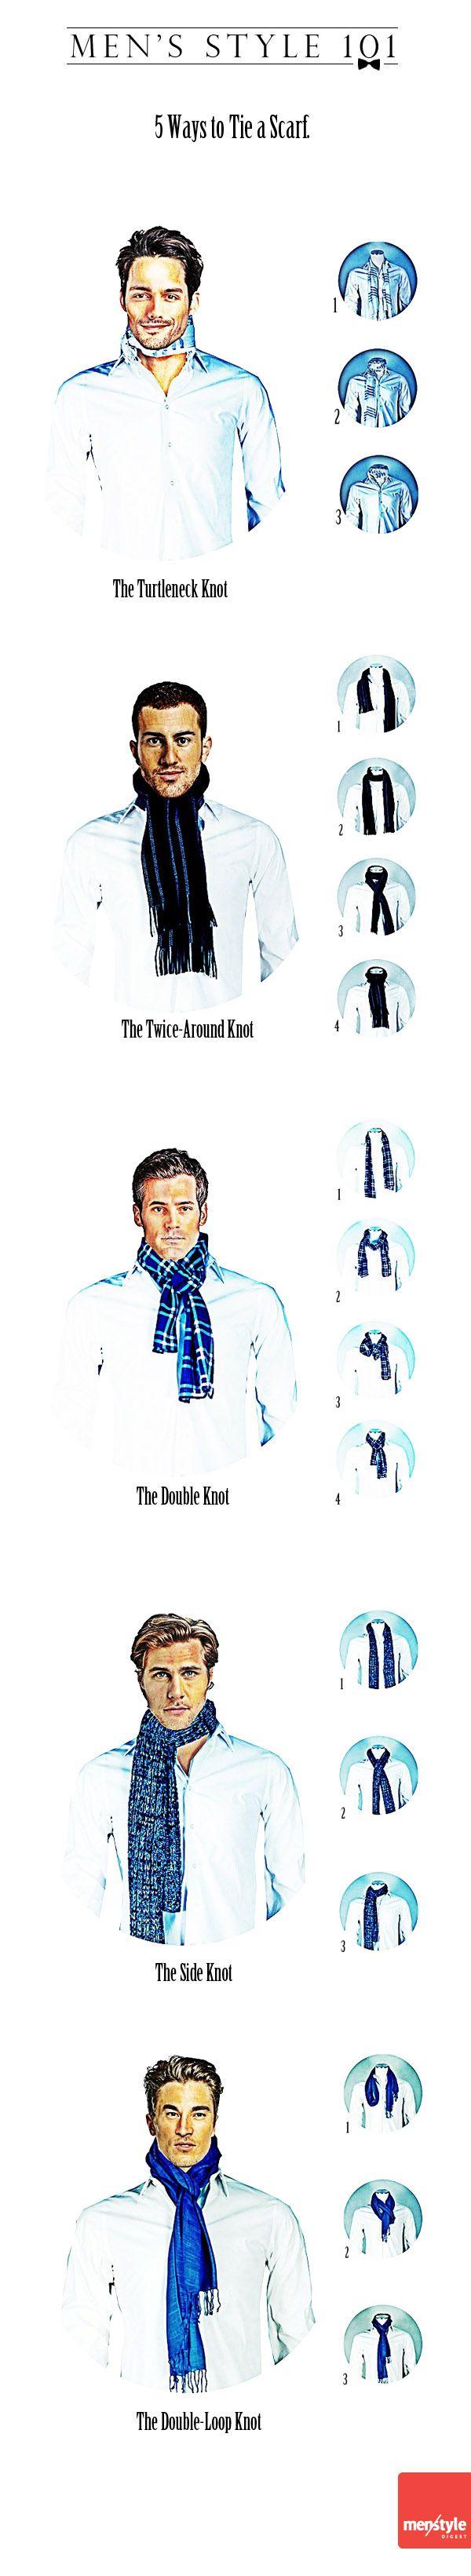 Men's style - 5 ways to tie a scarf